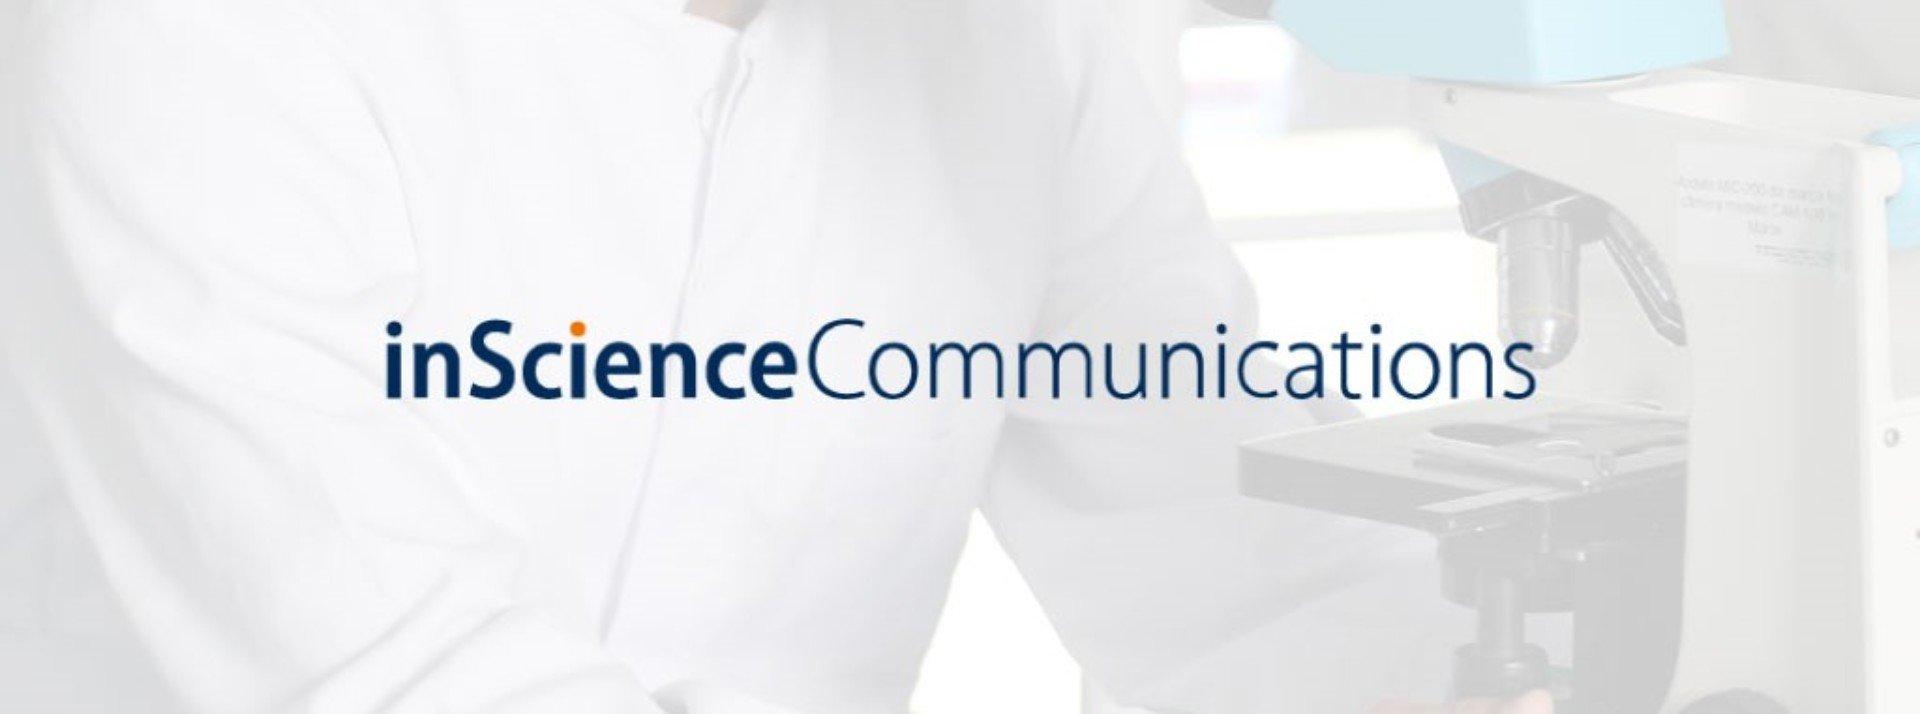 InScience Communications